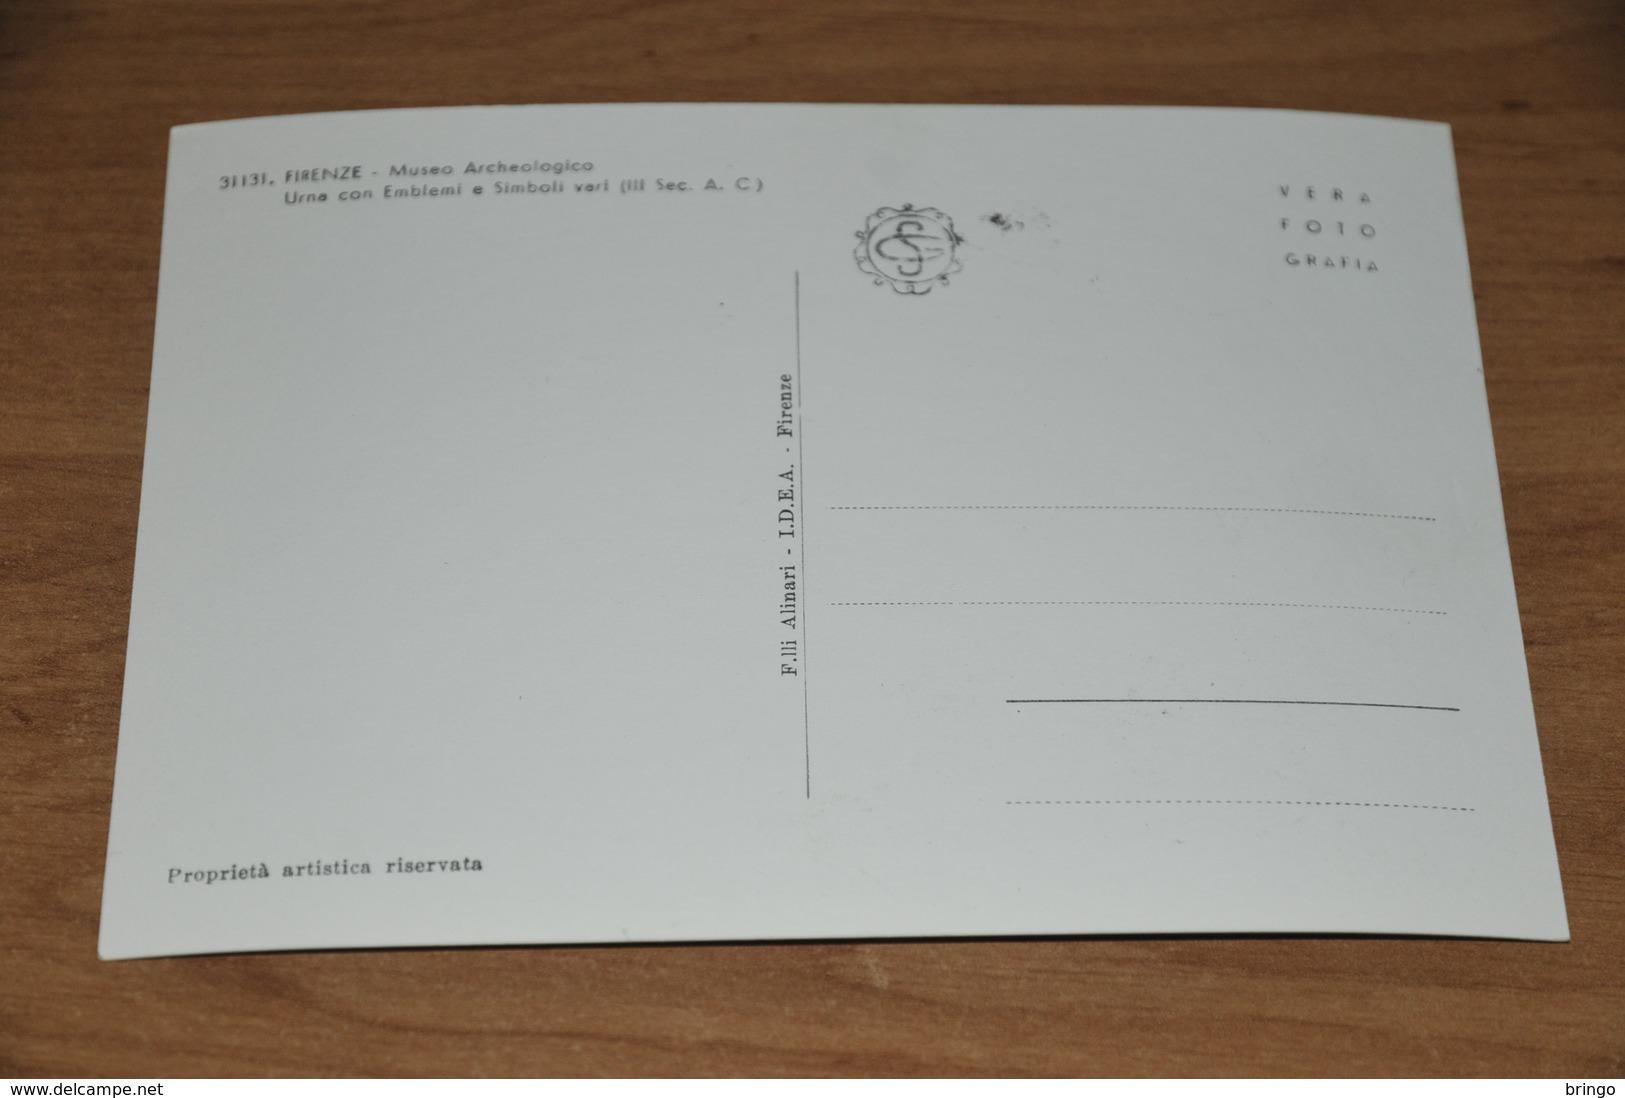 11390-  FIRENZE, MUSEO ARCHEOLOGICO, URNA CON EMBLEMI E SIMBOLI VARI - Firenze